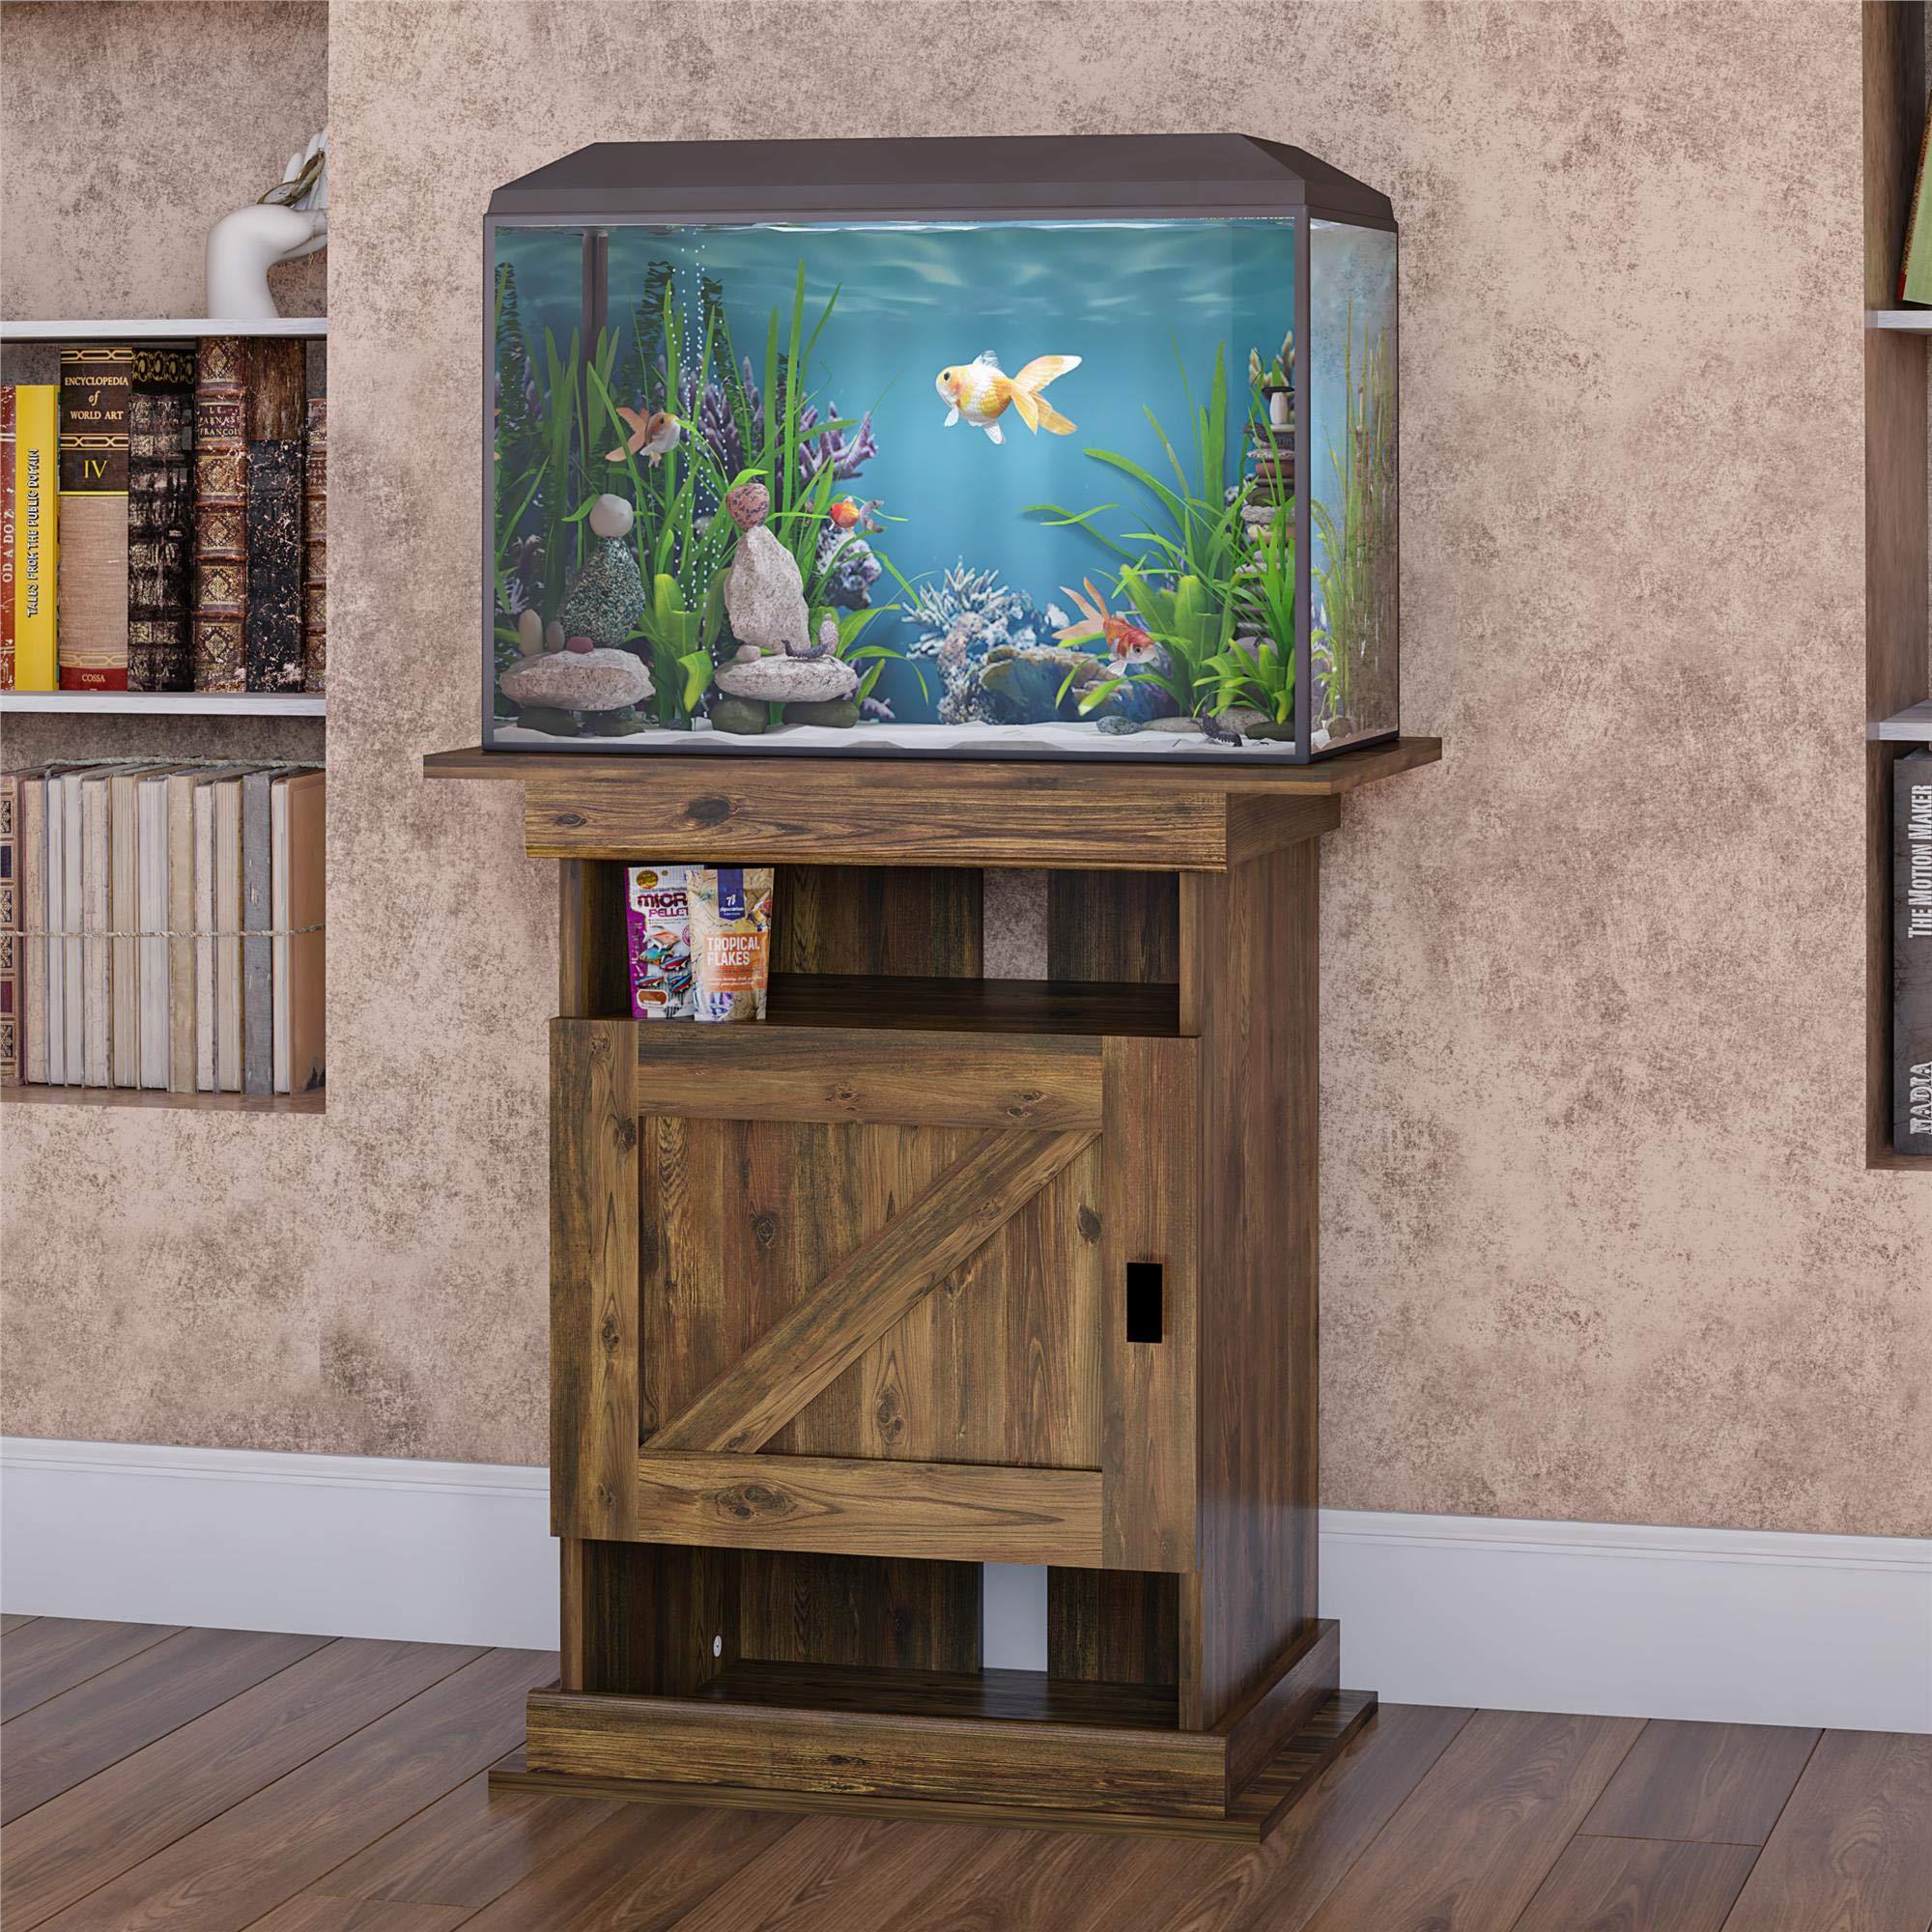 Ollie & Hutch Farmington Flipper, Rustic aquarium stand